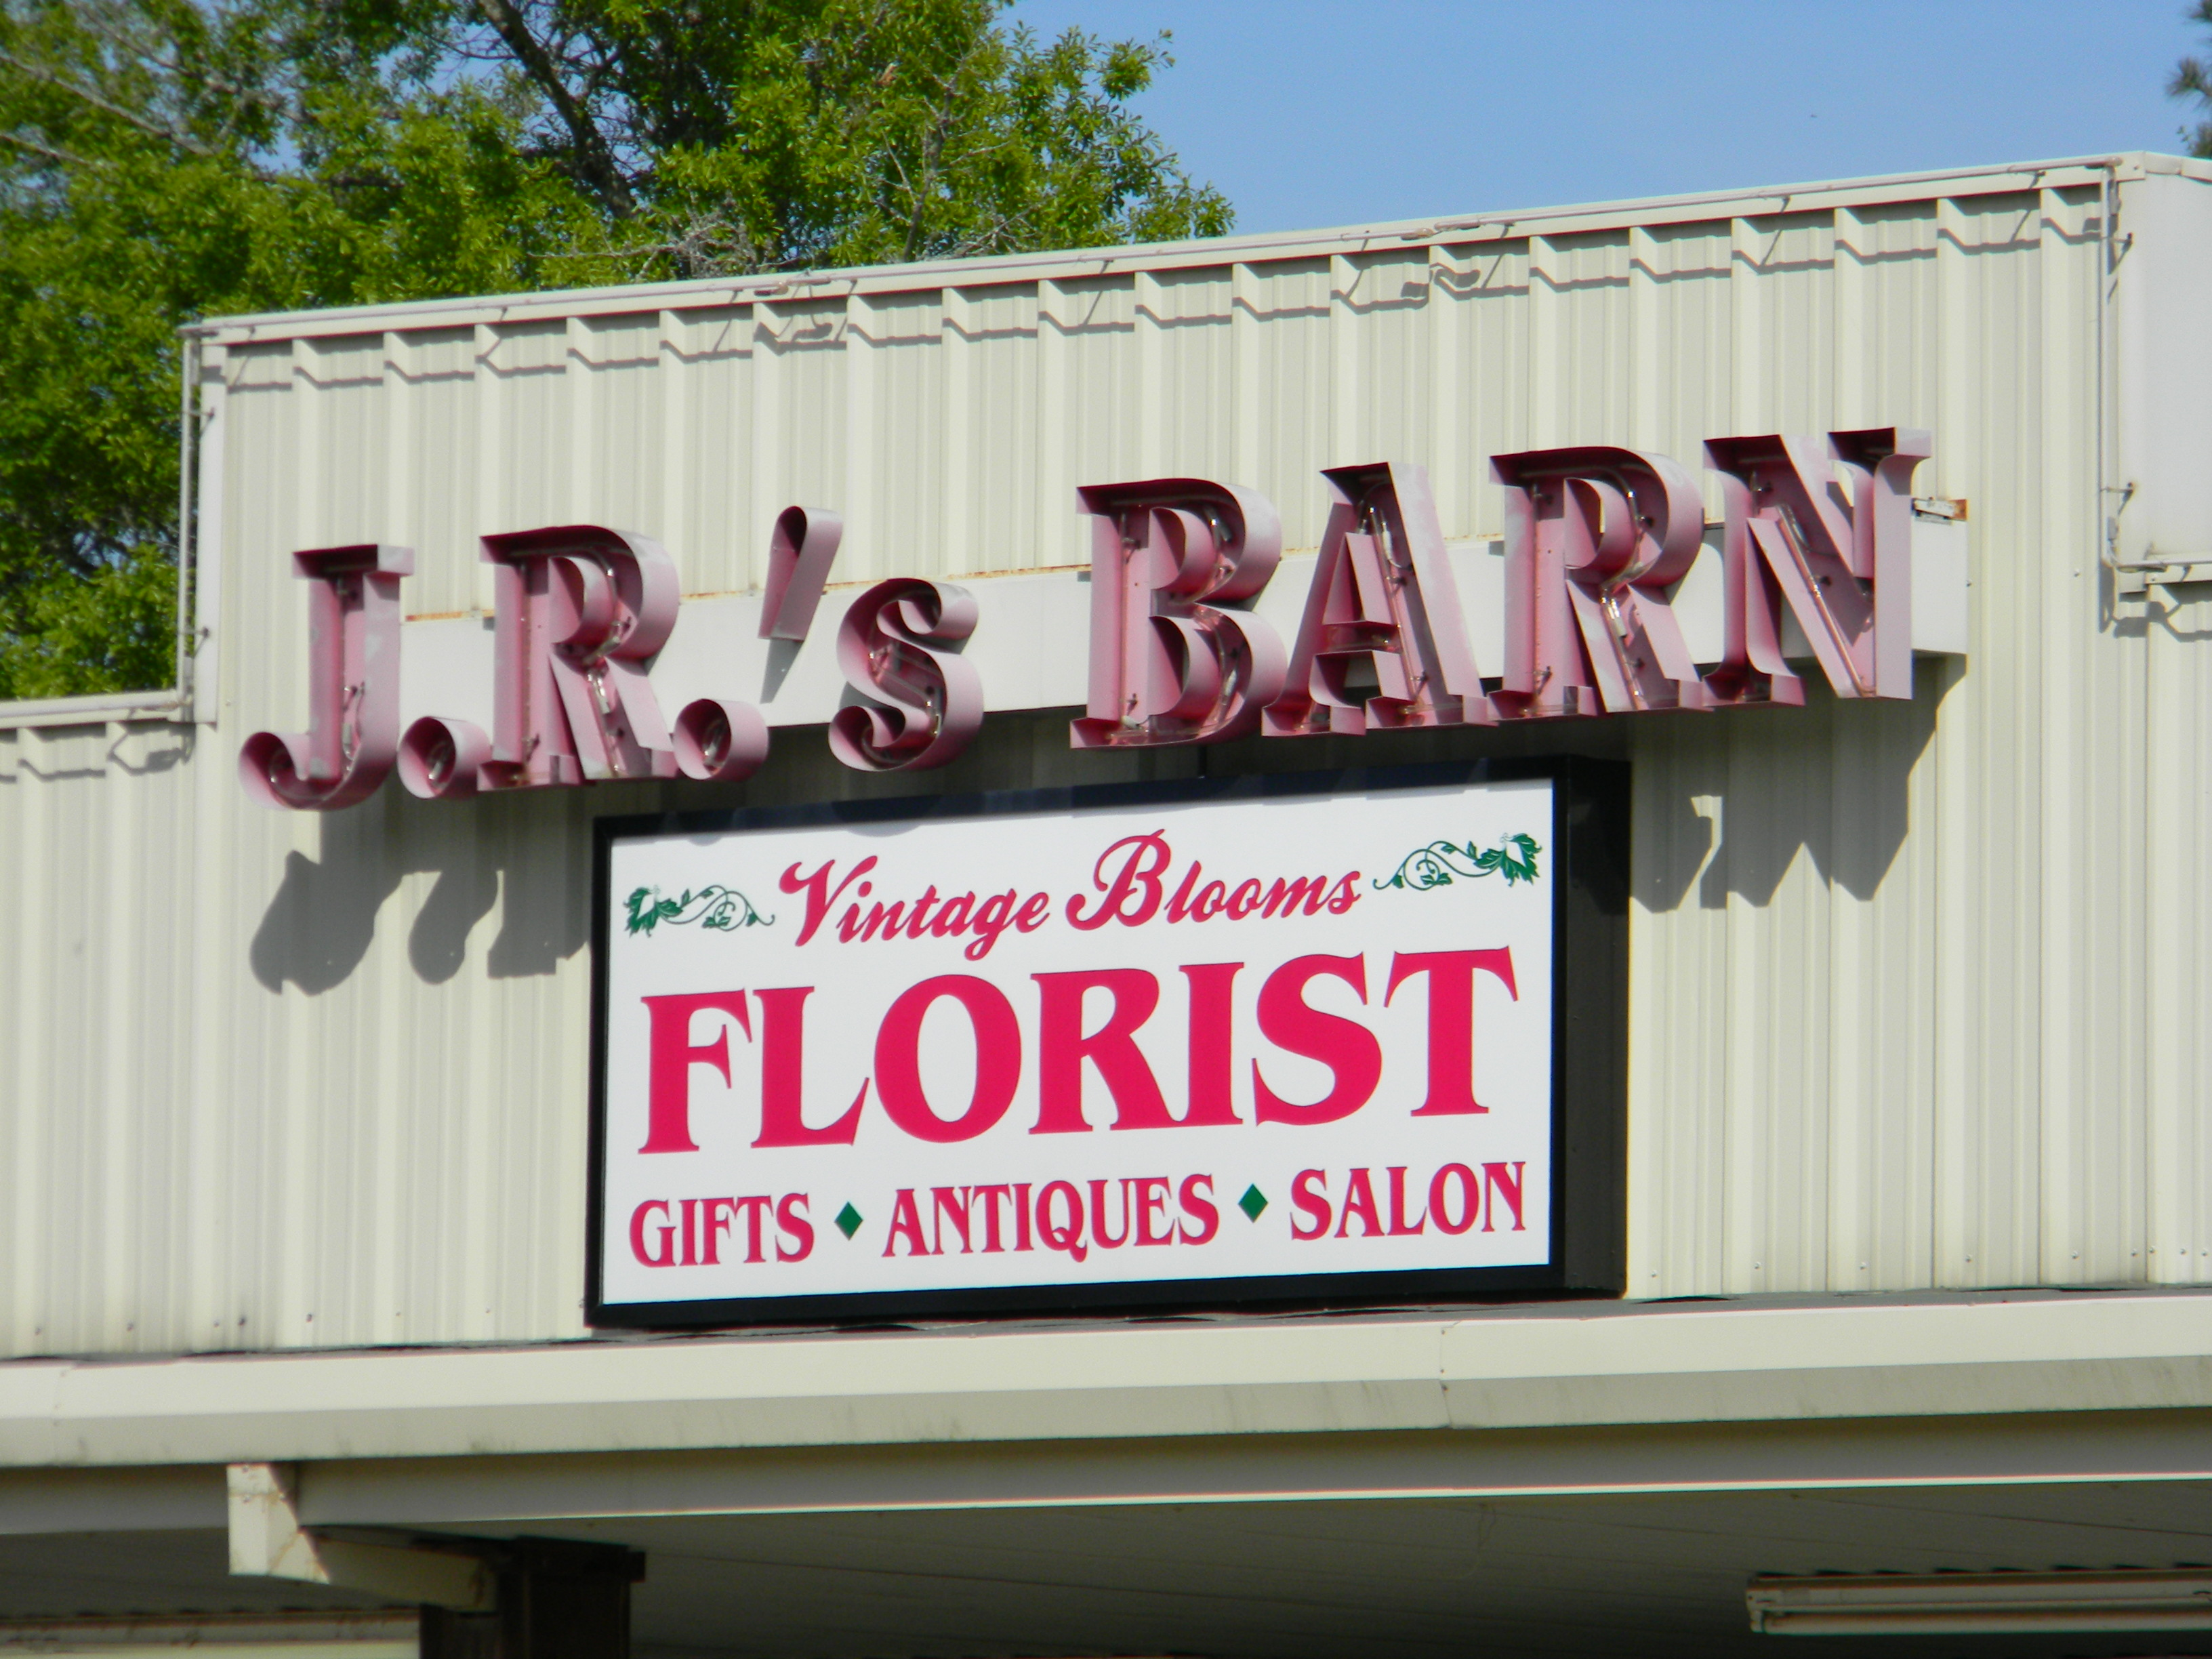 jrs-barn-sign